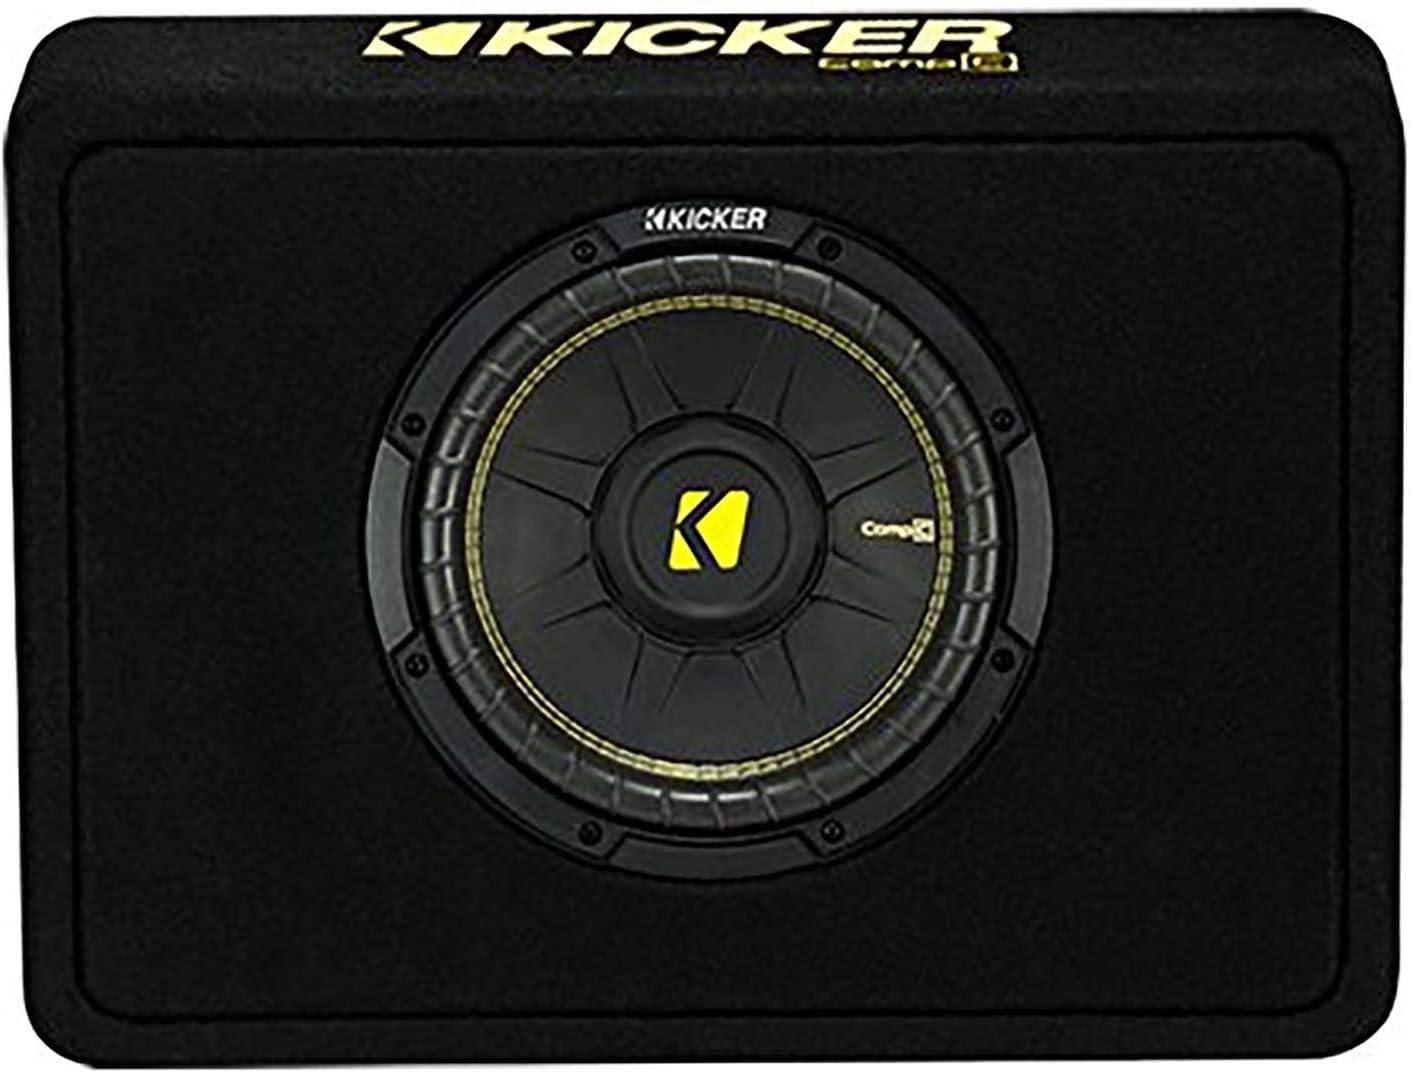 Kicker 10 600 Watt 4 Ohm Vented Thin Profile Subwoofer Enclosure 44TCWC104